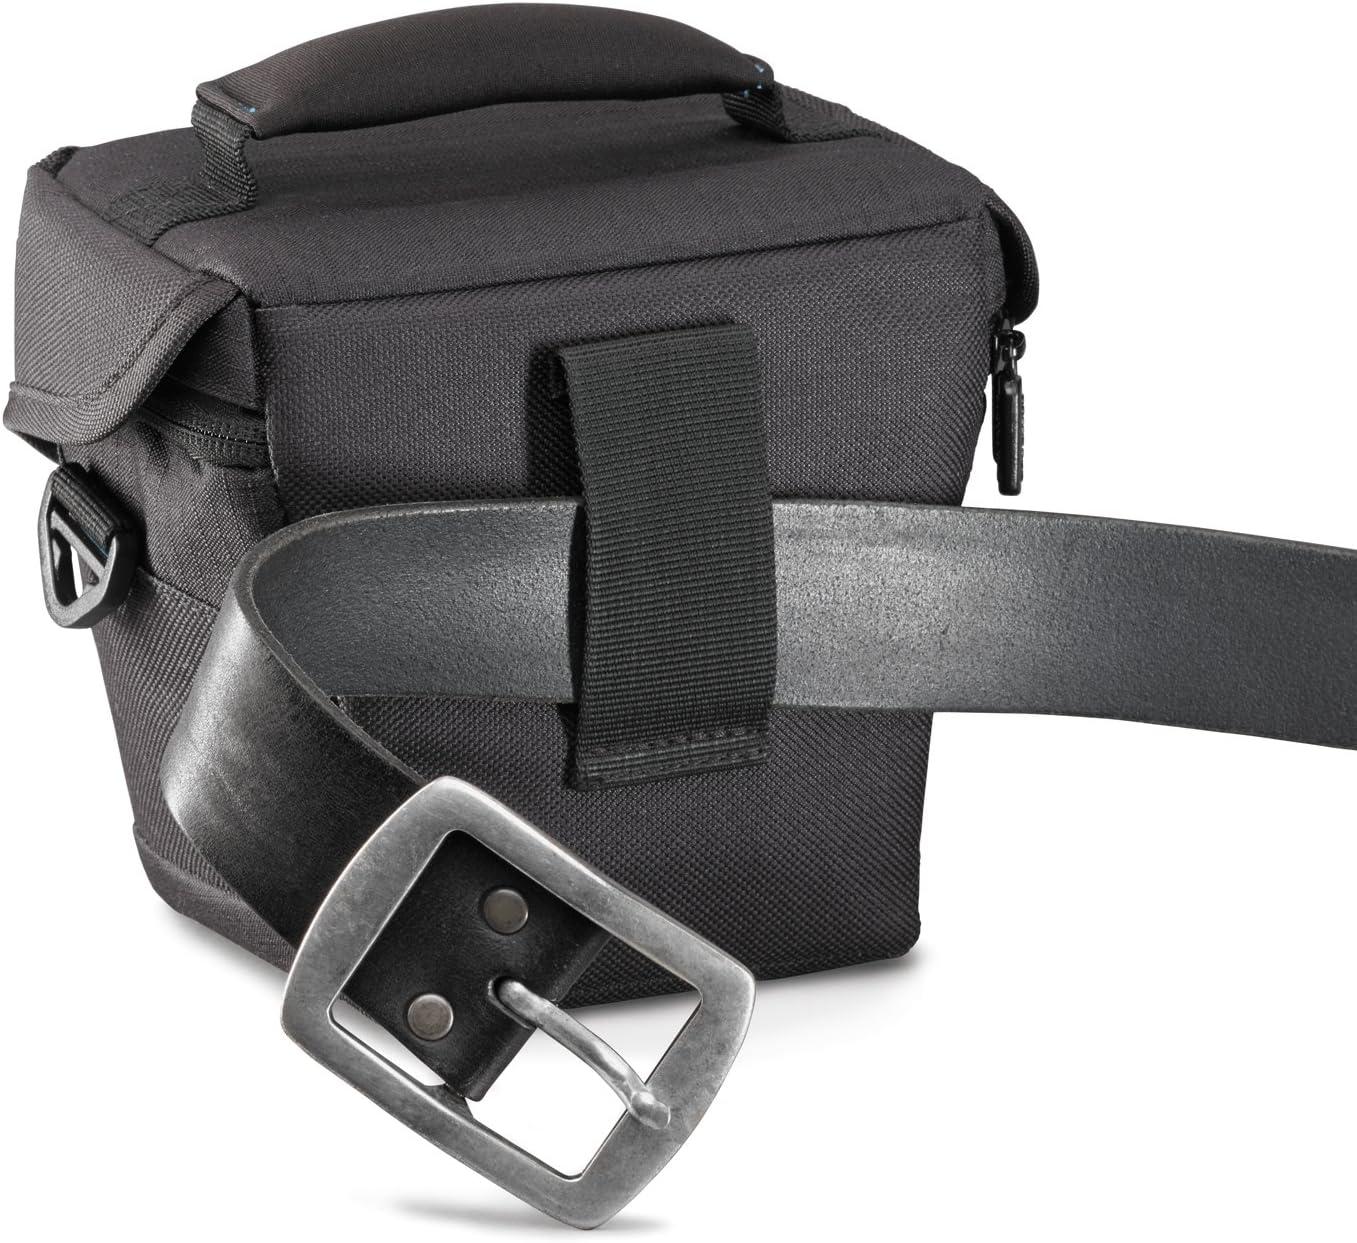 Black CULLMANN 93703 Panama Vario 100 Bag for Camera Equipment